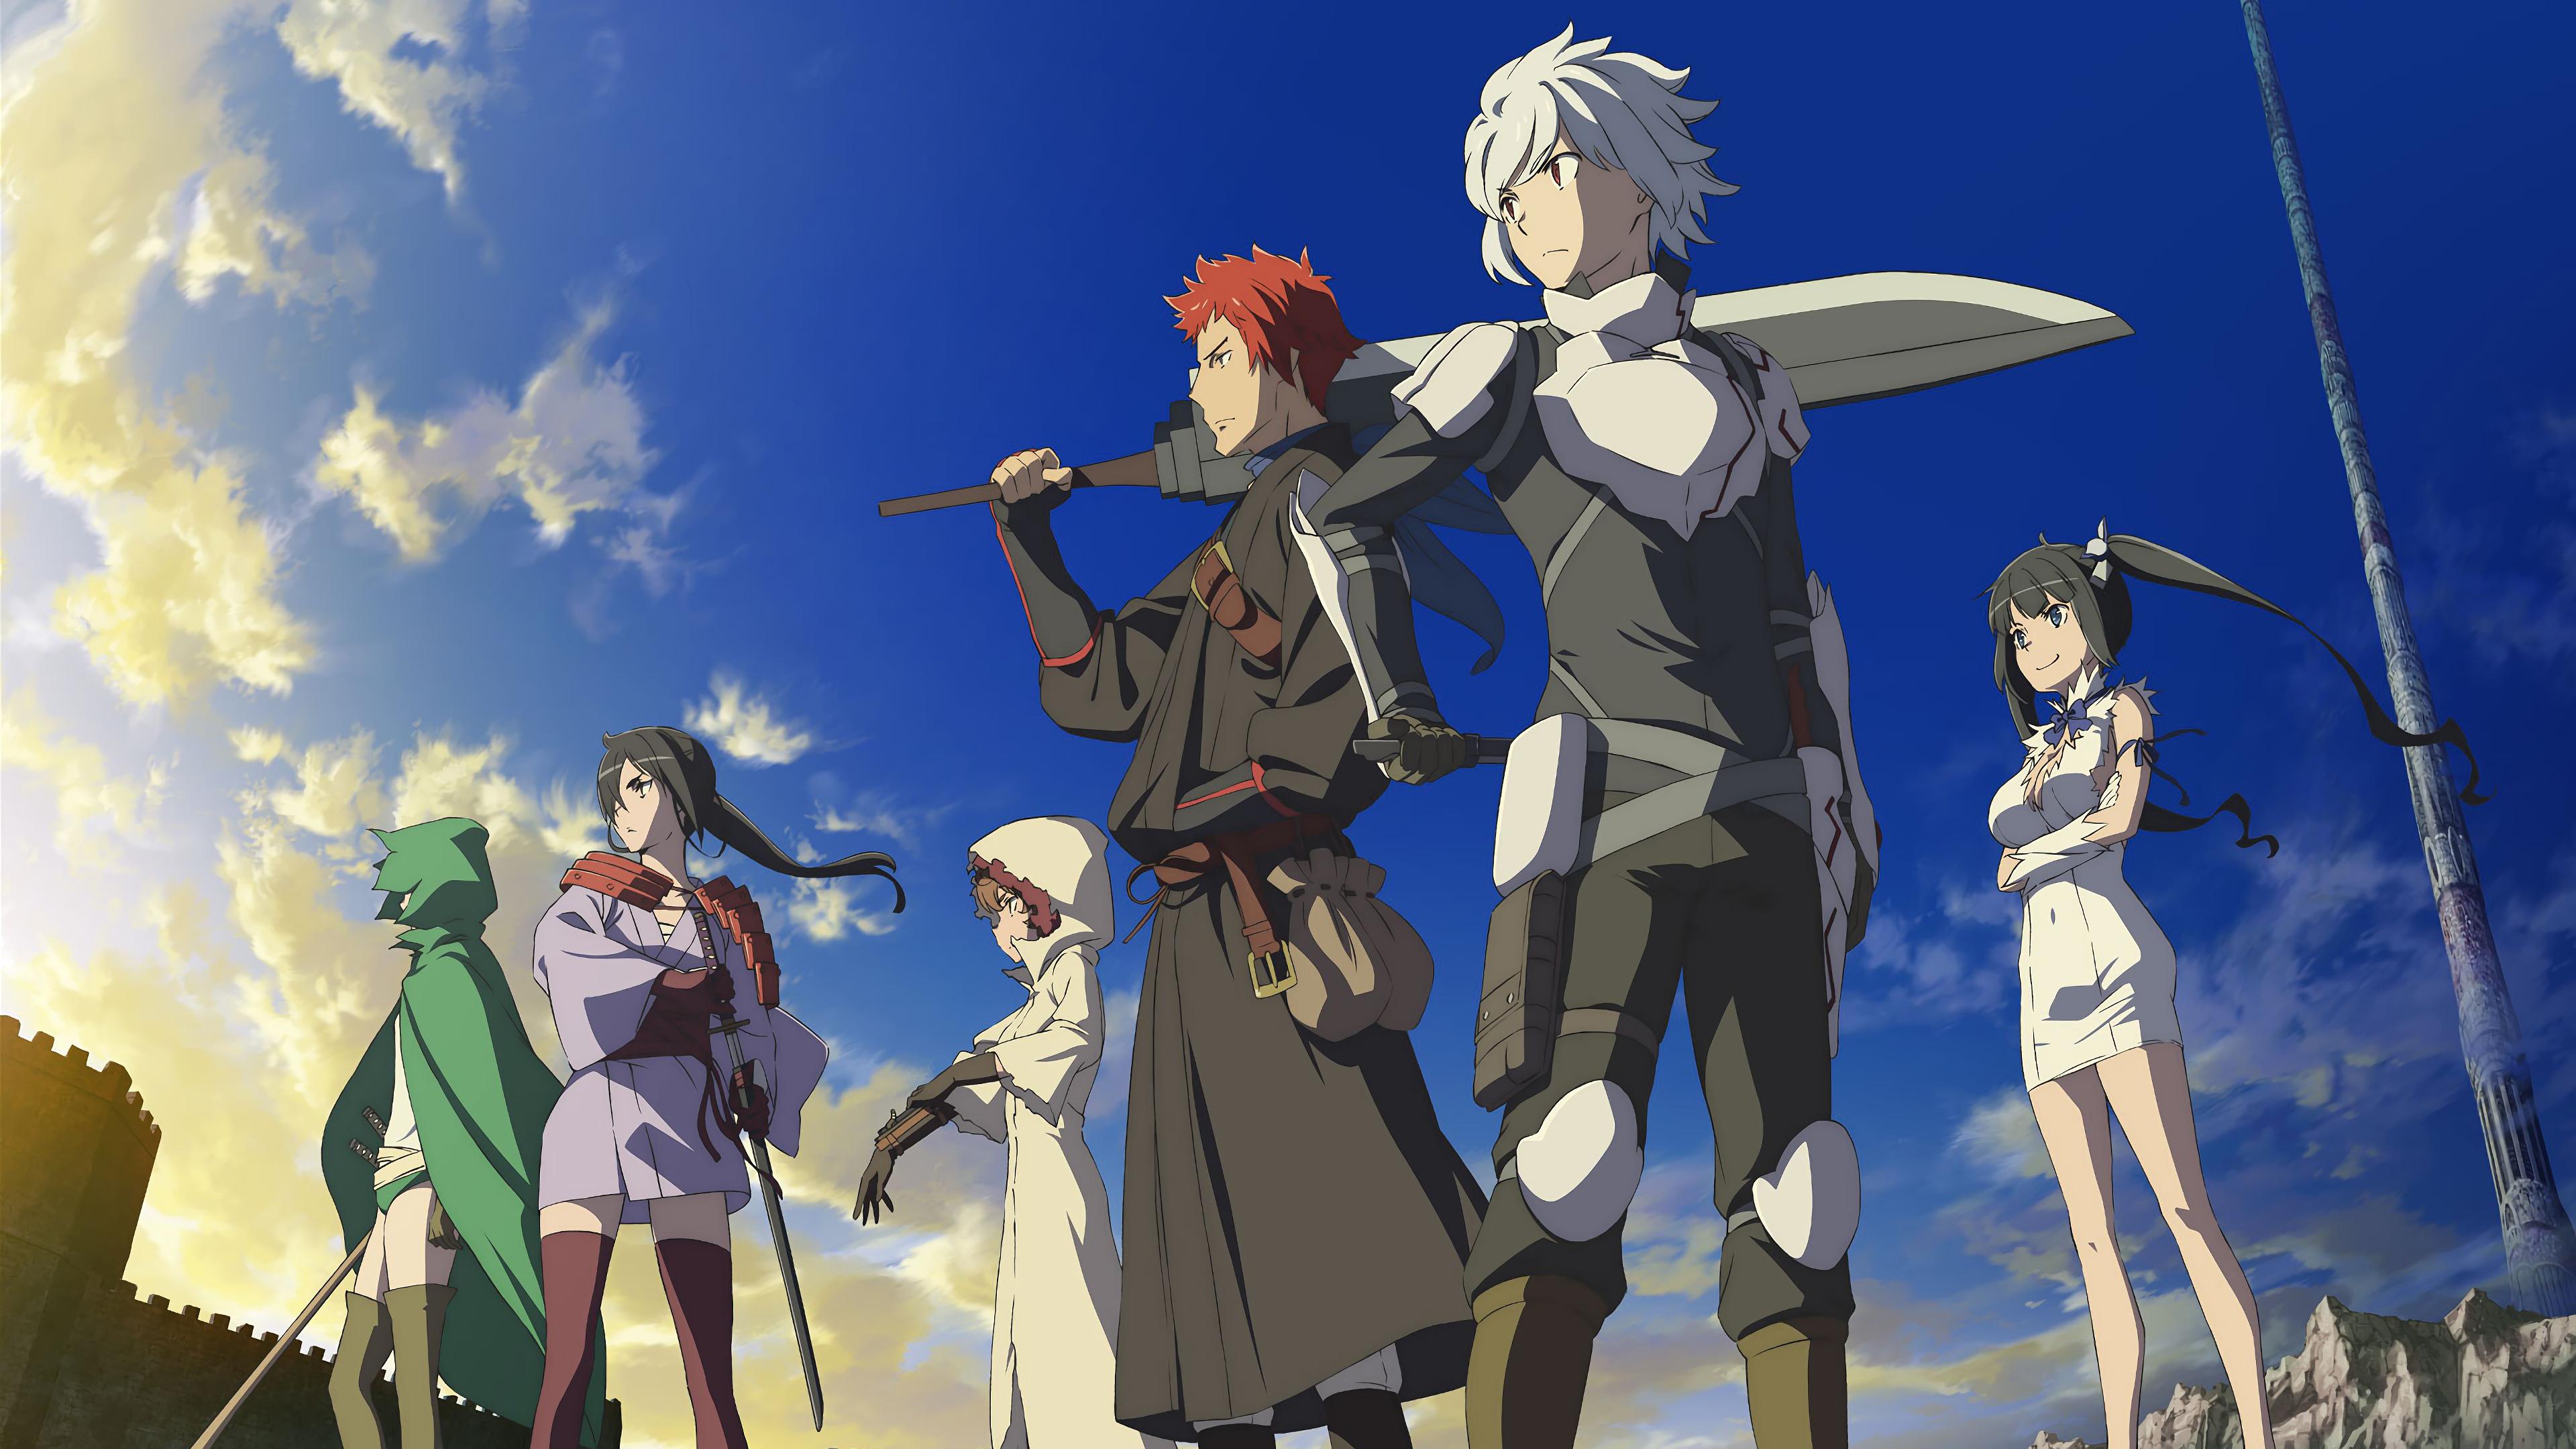 Unduh 90 Wallpaper Hd Anime Danmachi HD Gratid